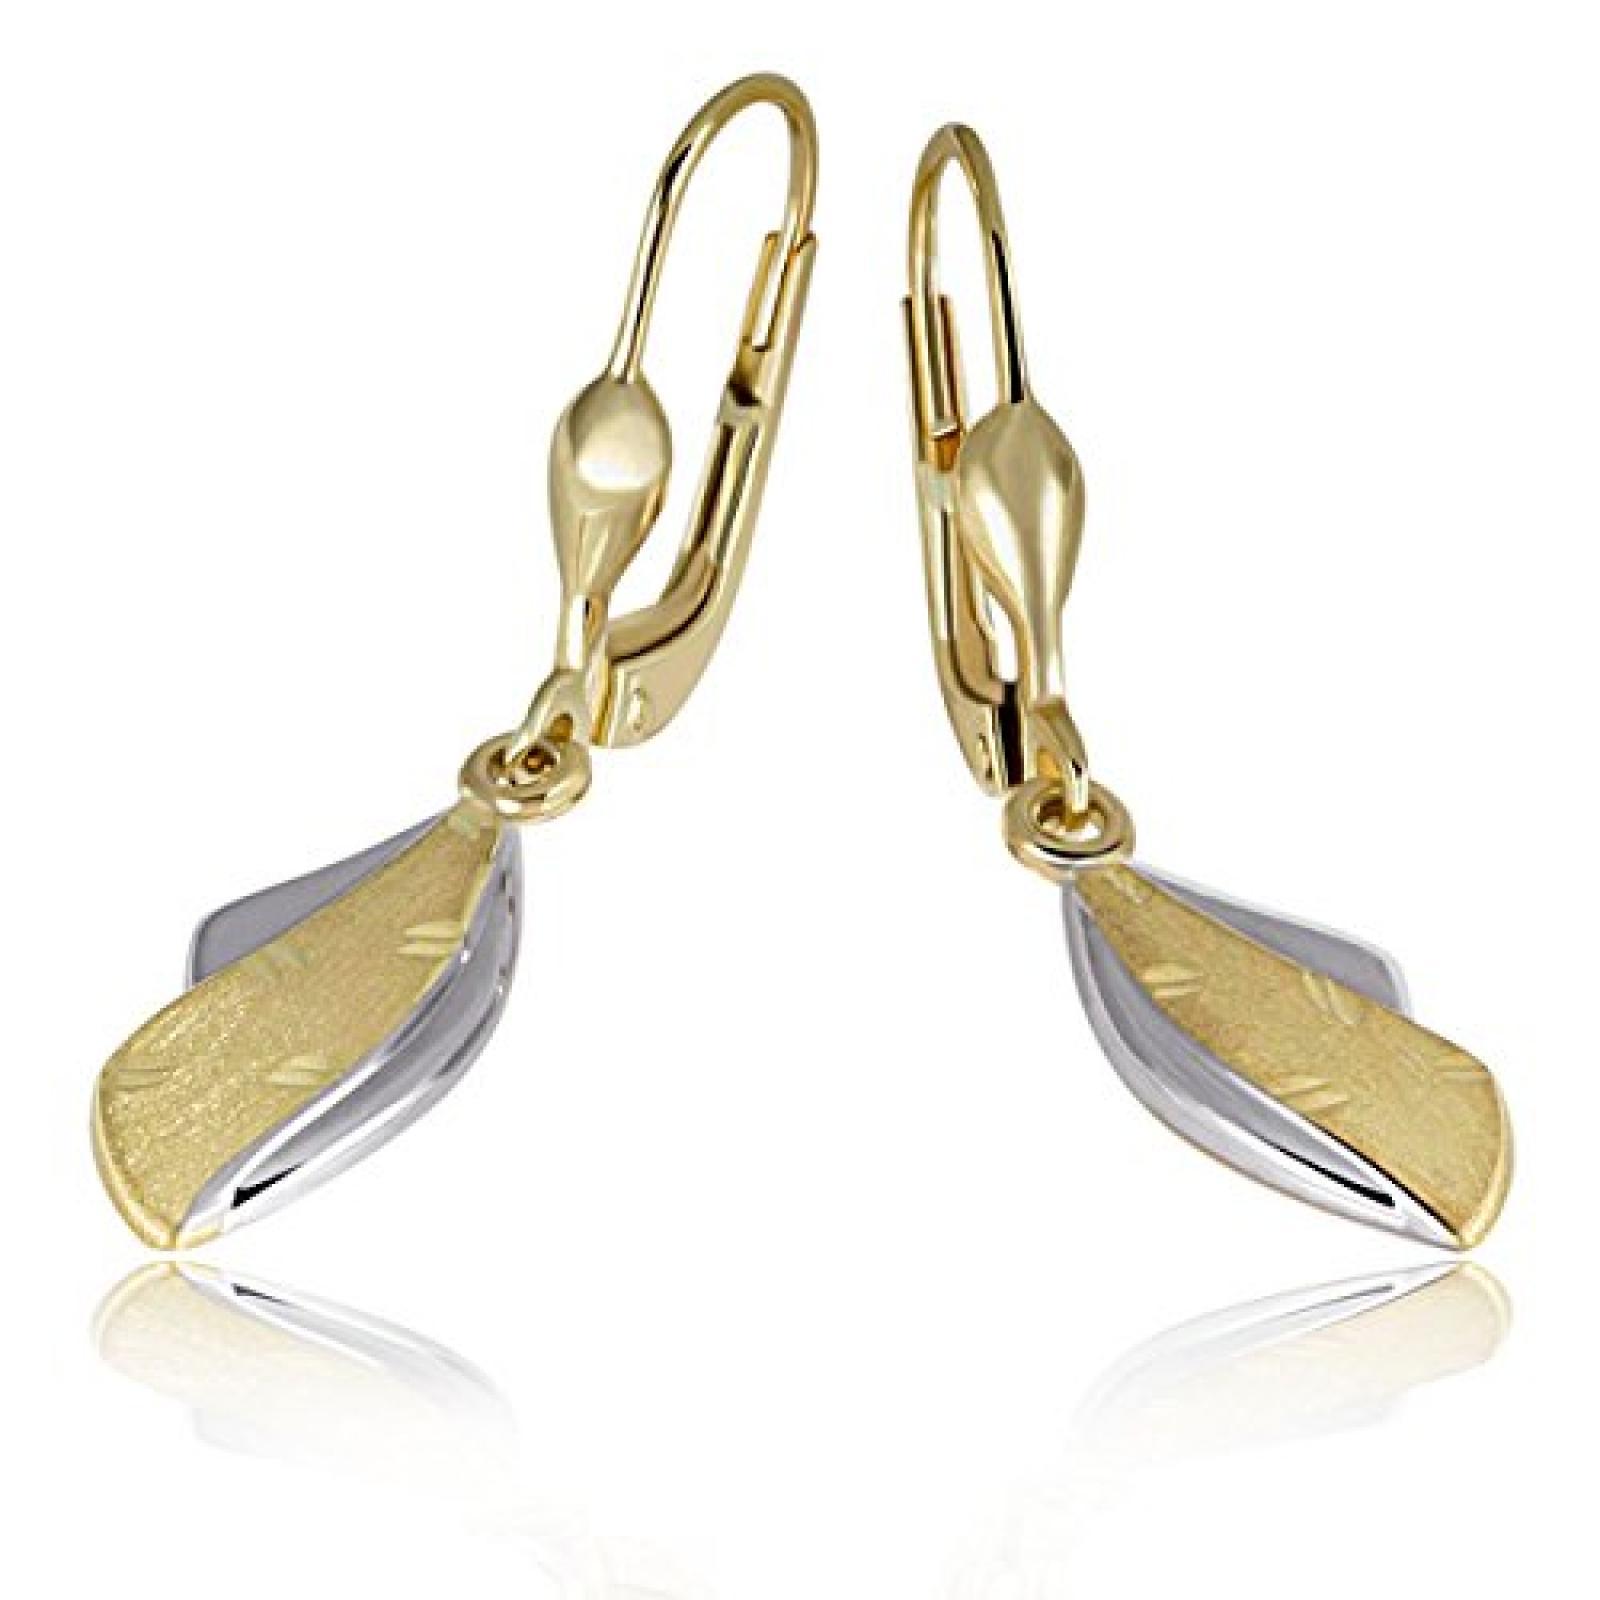 goldmaid Damen-Ohrhänger 333 Bicolor Gold Pr O4400GG